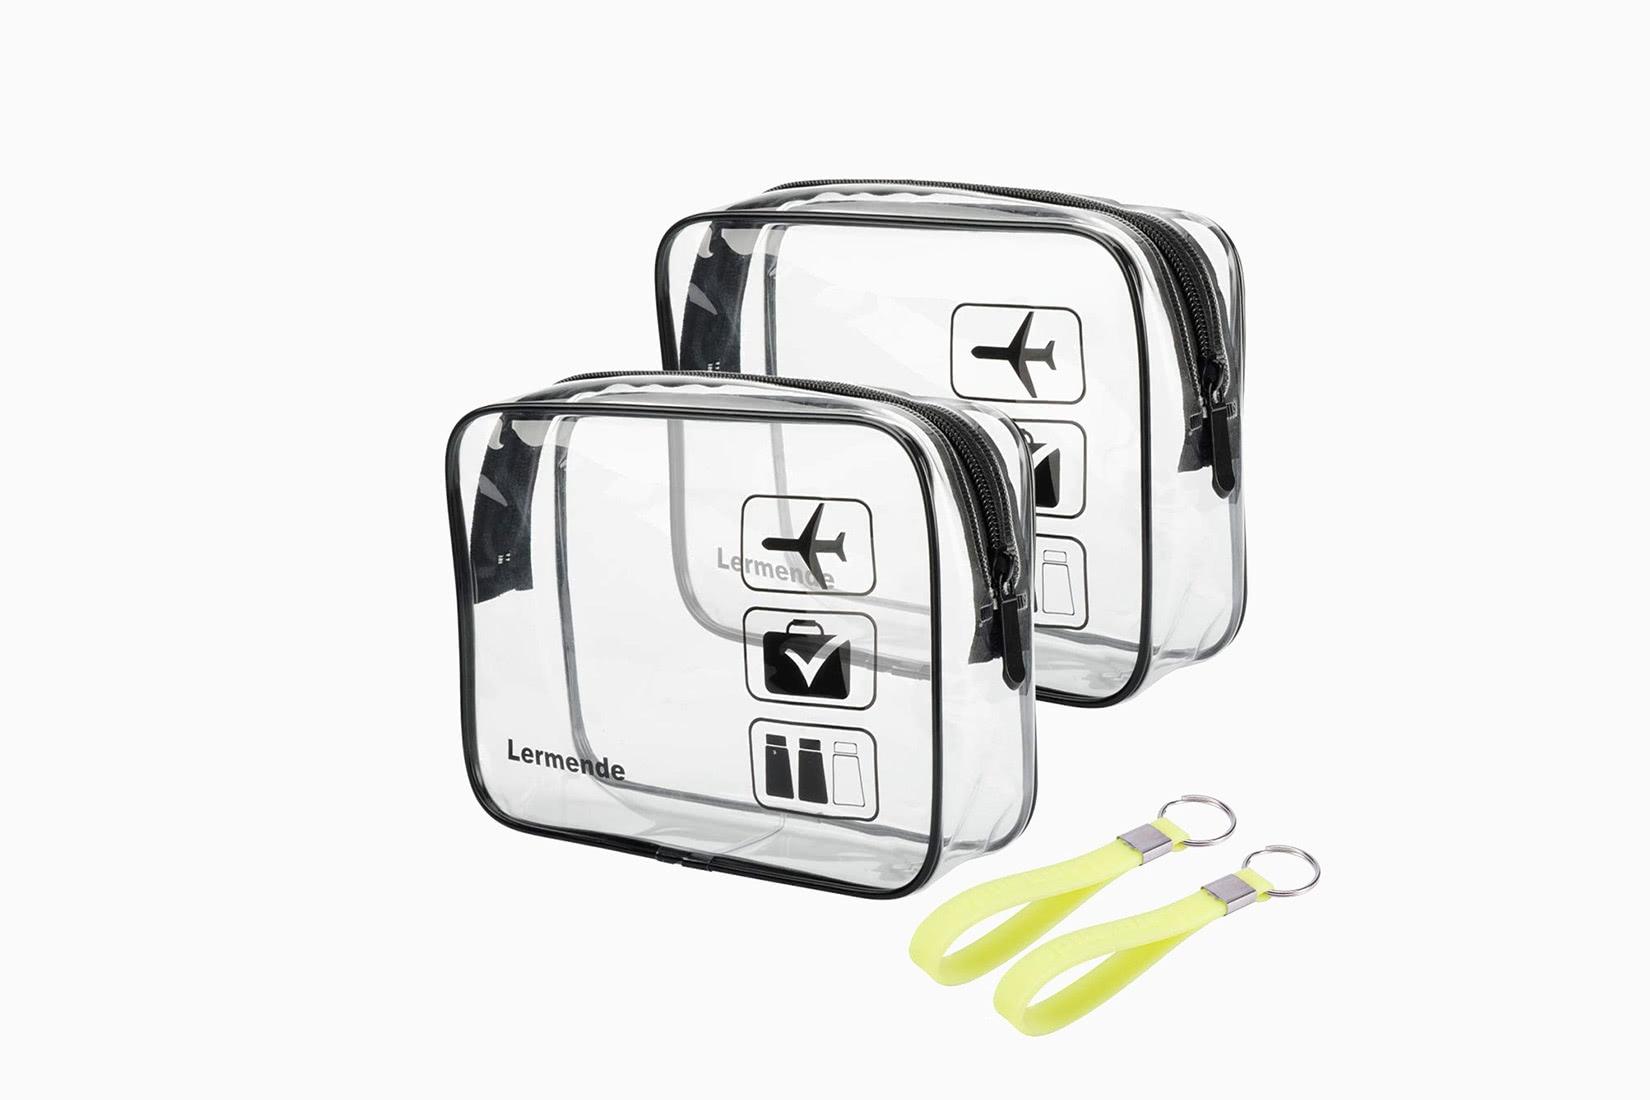 best toiletry bag women clear carry-on lermende - Luxe Digital